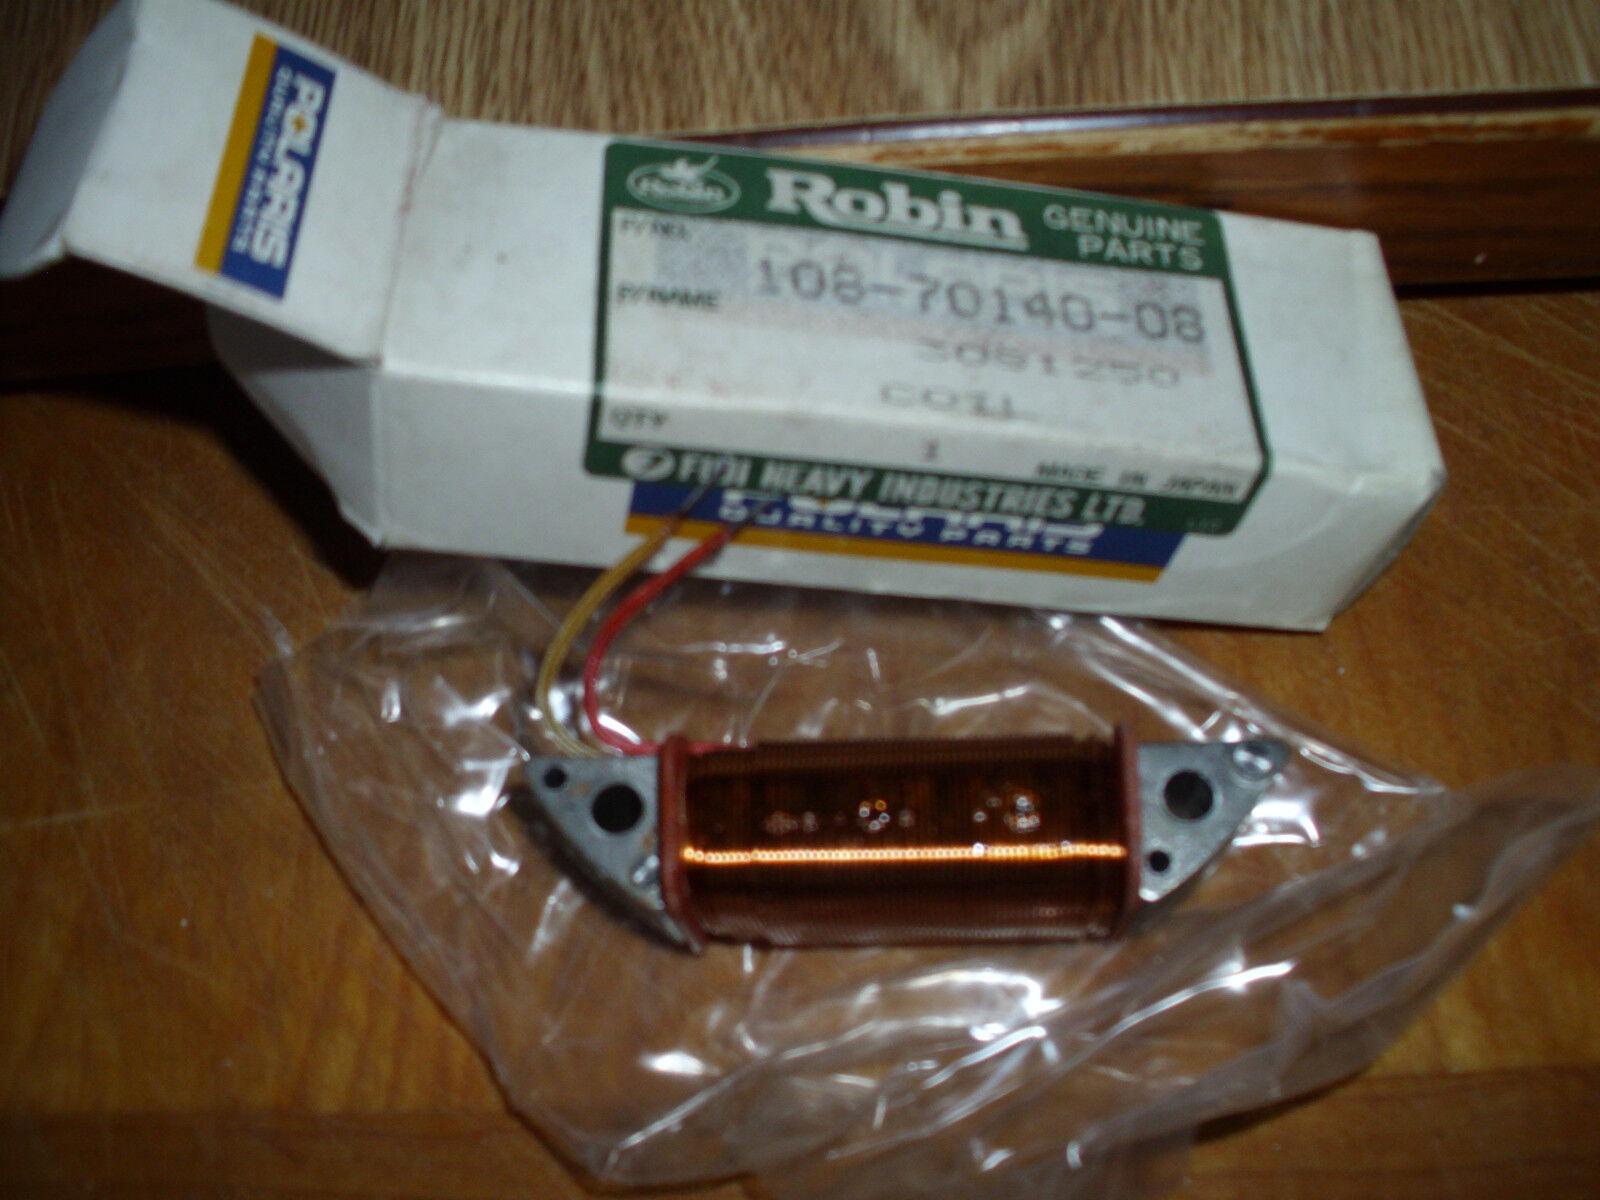 Picture 1 of 1 & Vintage Polaris Snowmobile Electra Gemini Lighting Coil Stator ... azcodes.com